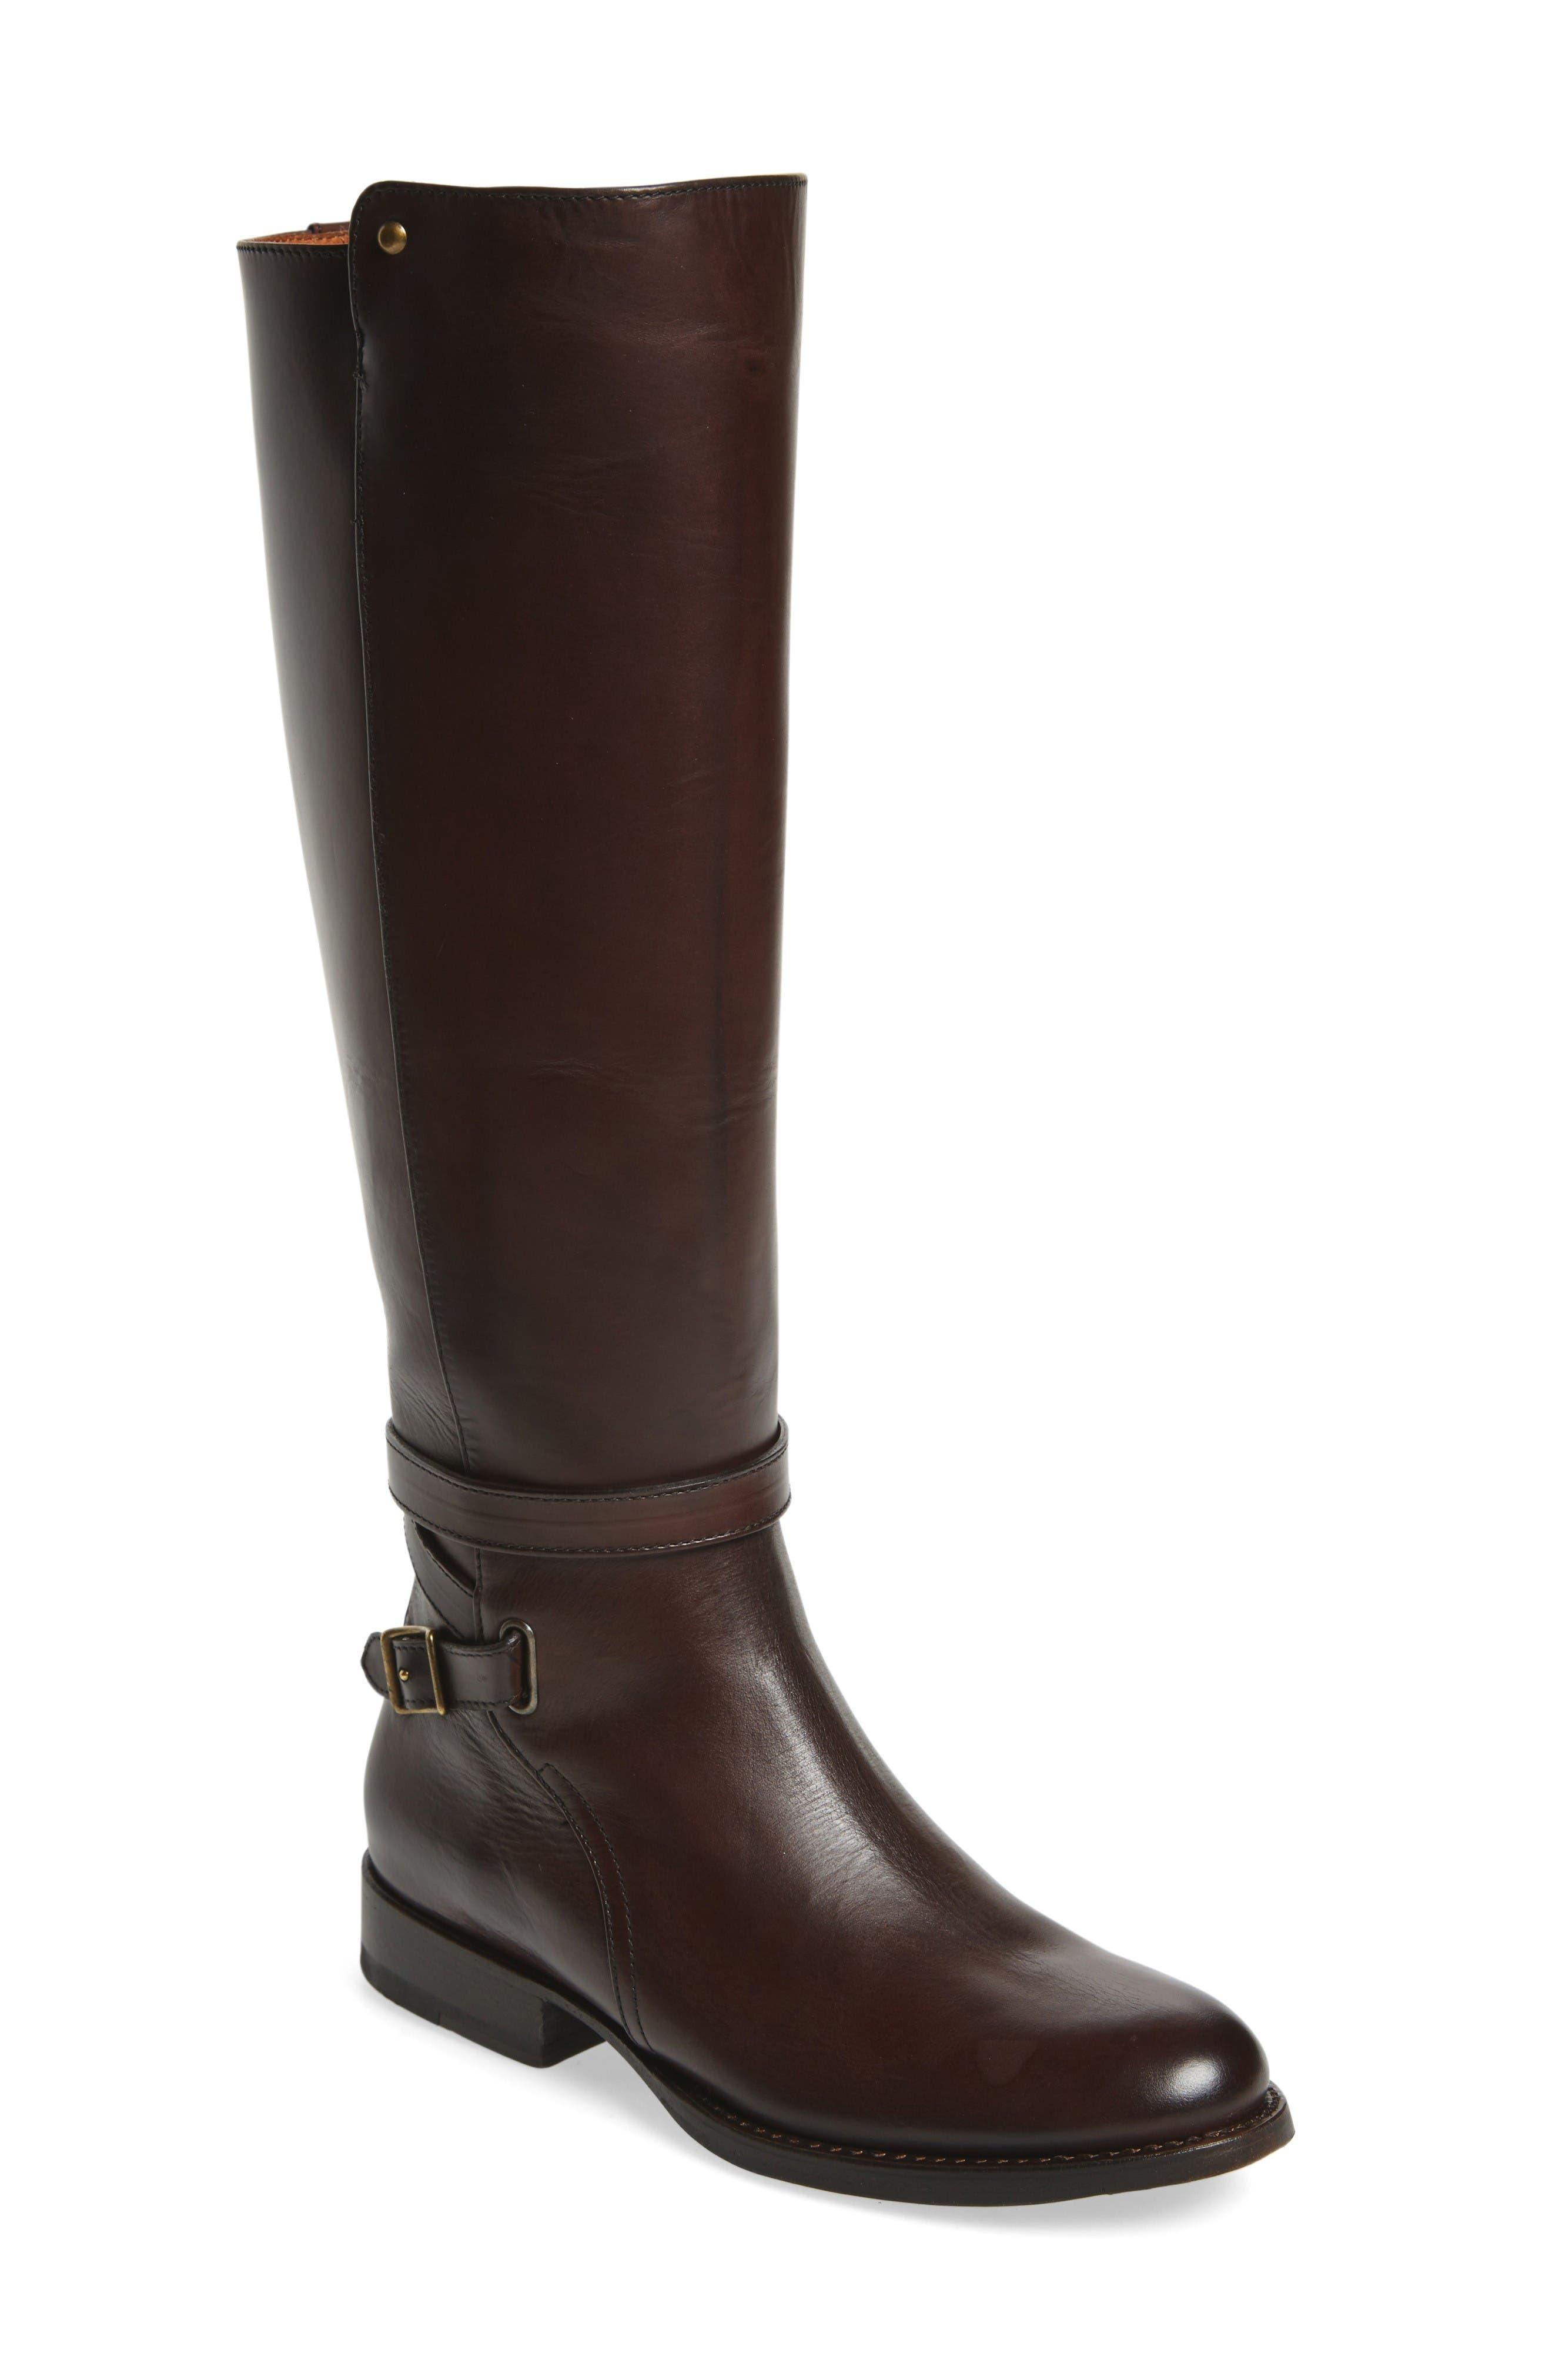 Alternate Image 1 Selected - Frye Jordan Buckle Strap Knee High Boot (Women)